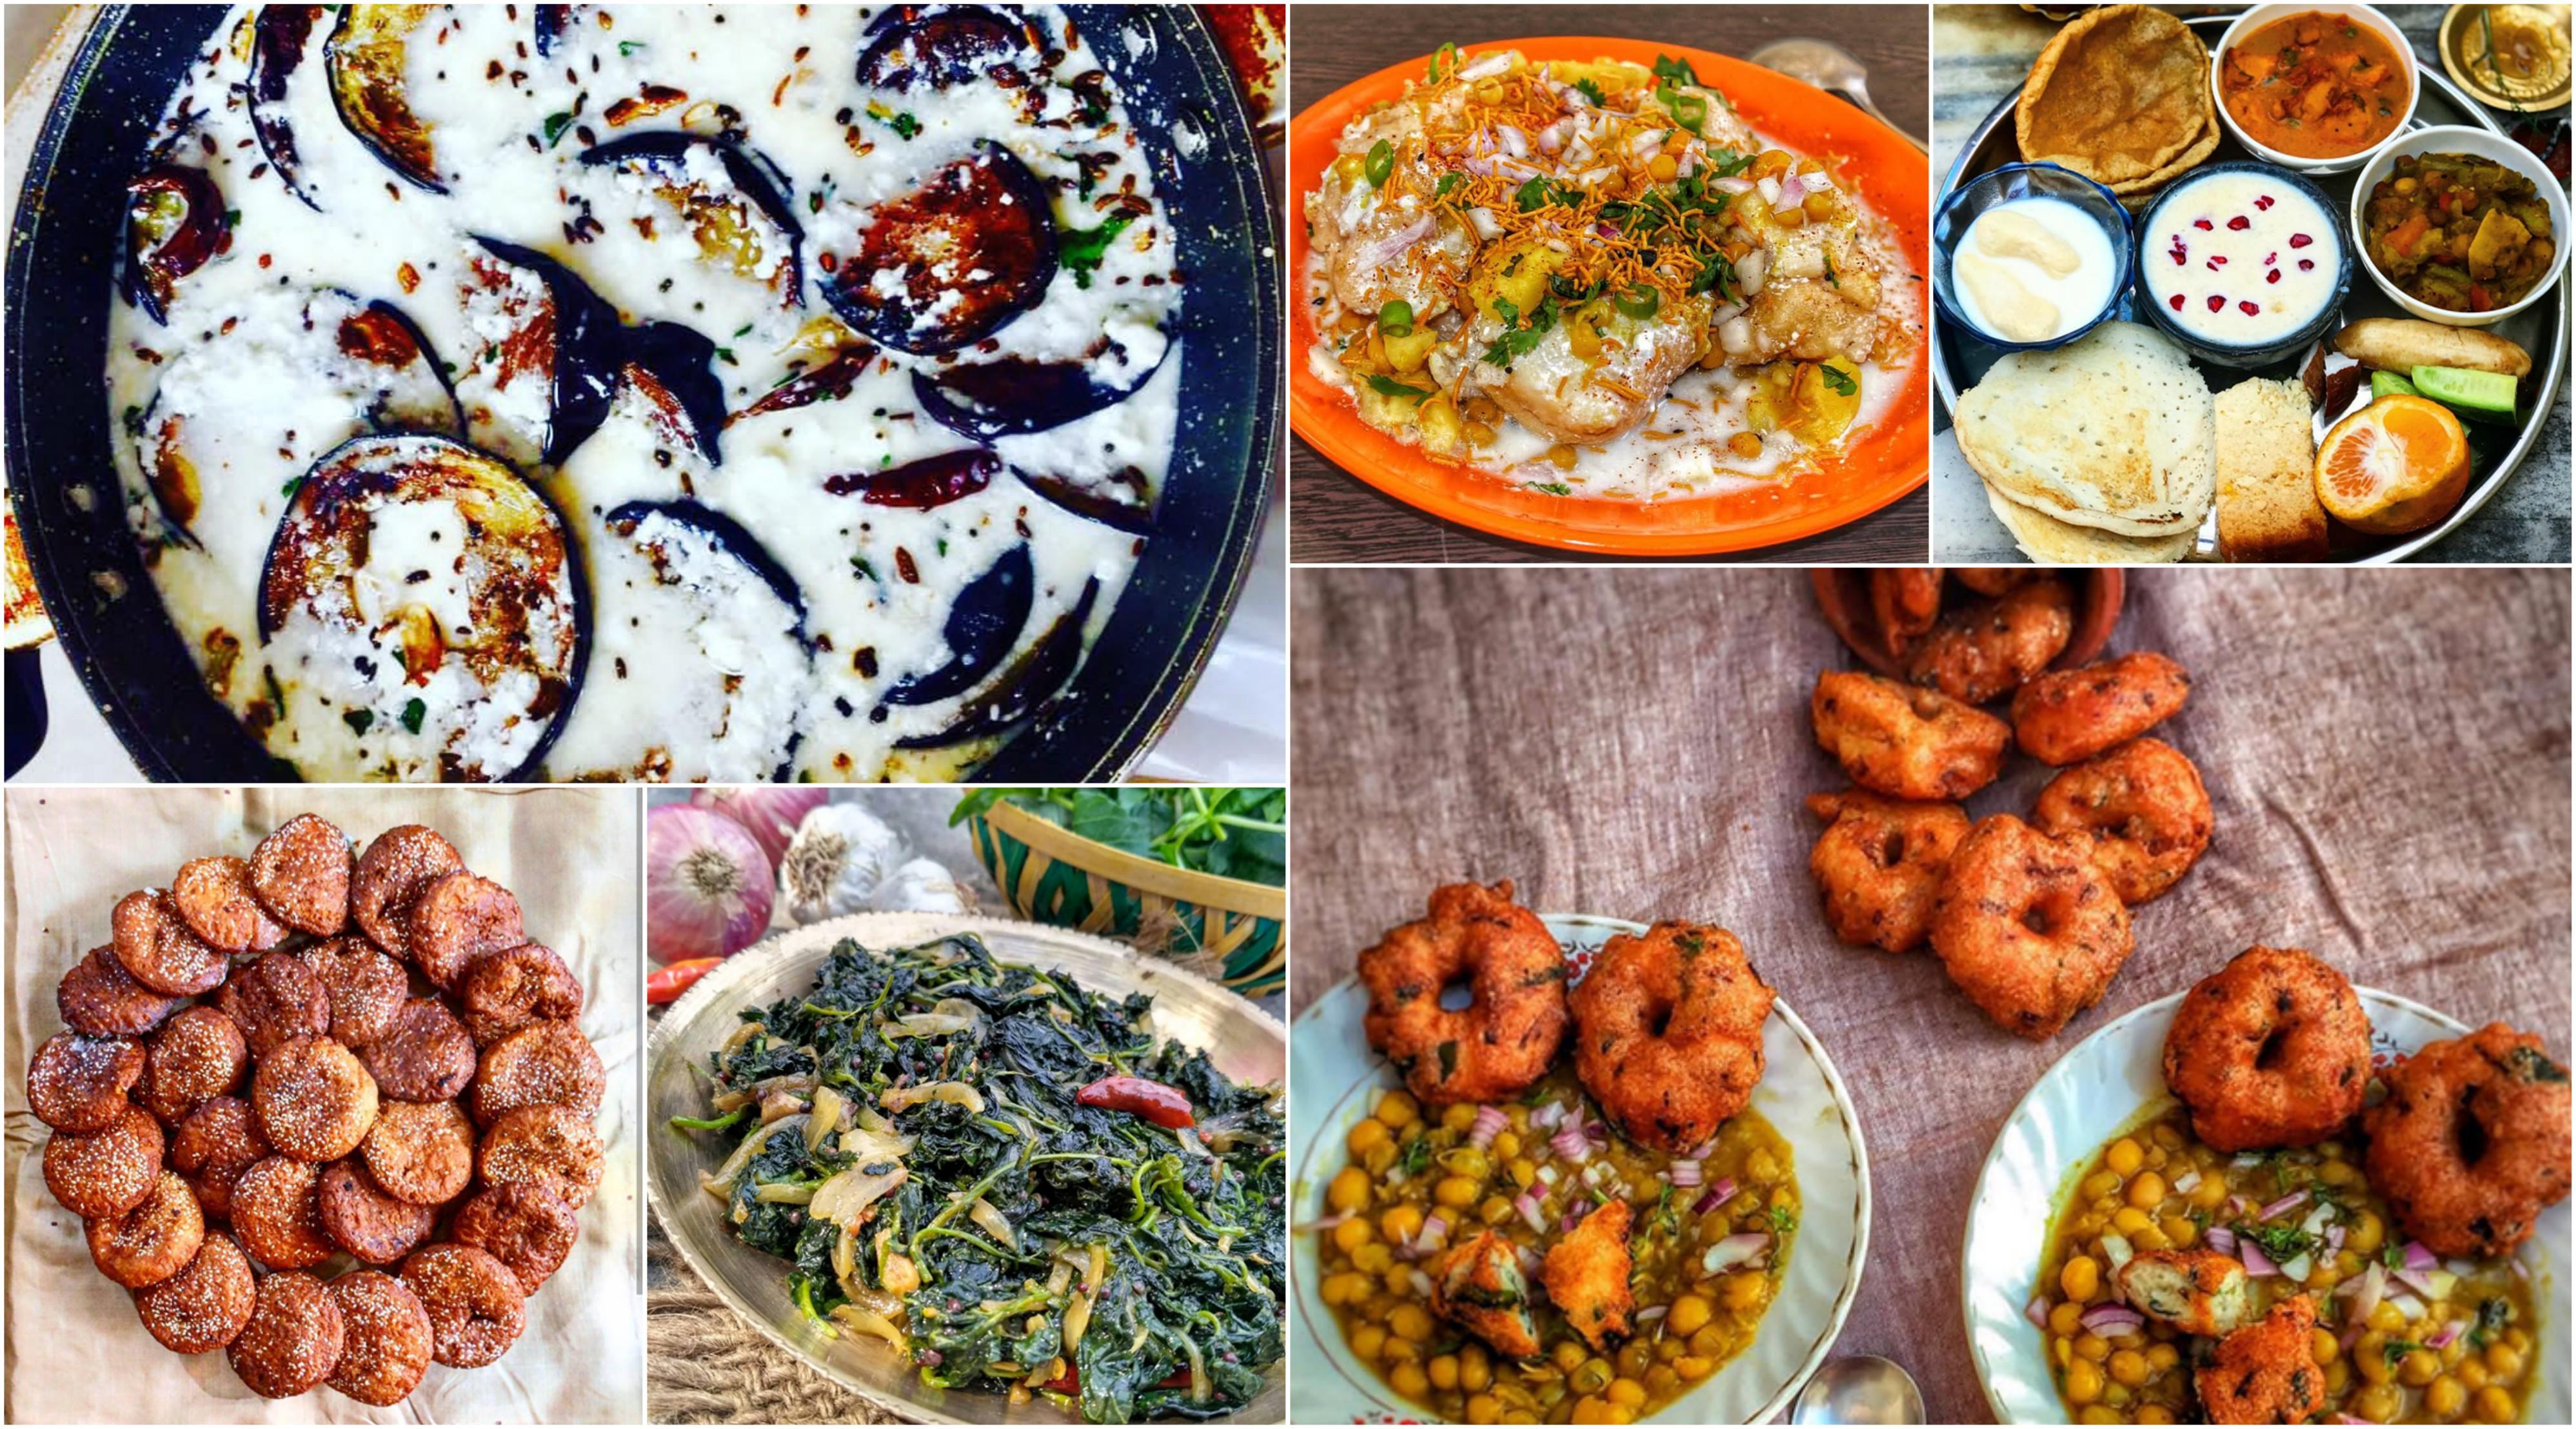 Food bloggers on Instagram